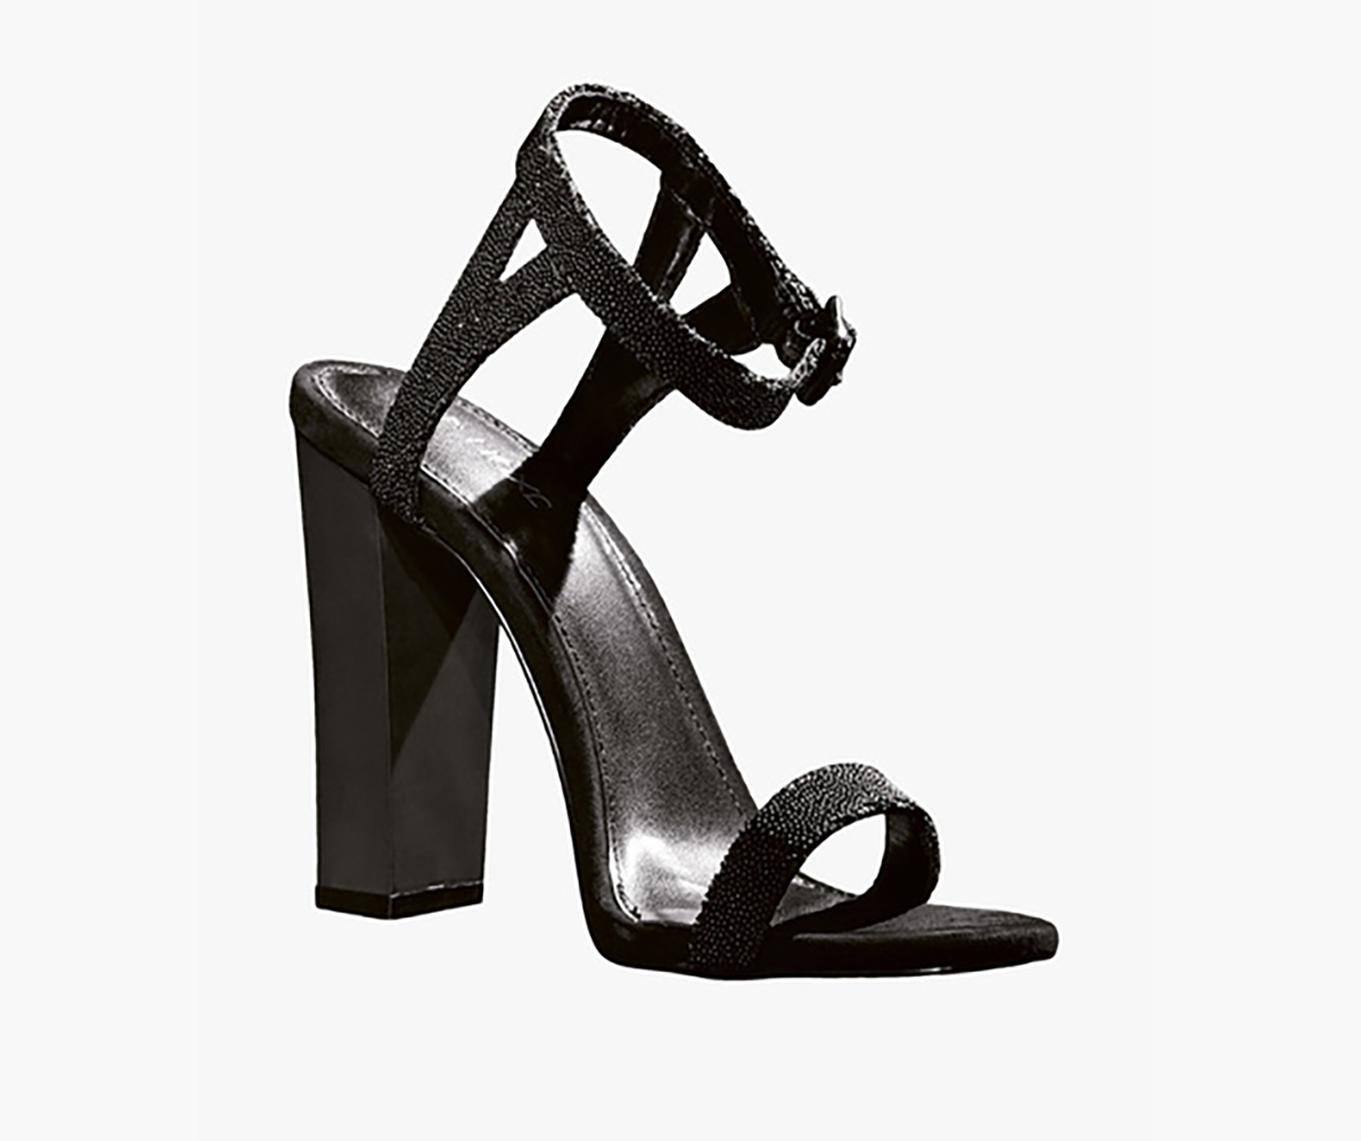 Next-Block-Heel-Sandals-0107-6992453-1-pdp_slider_l